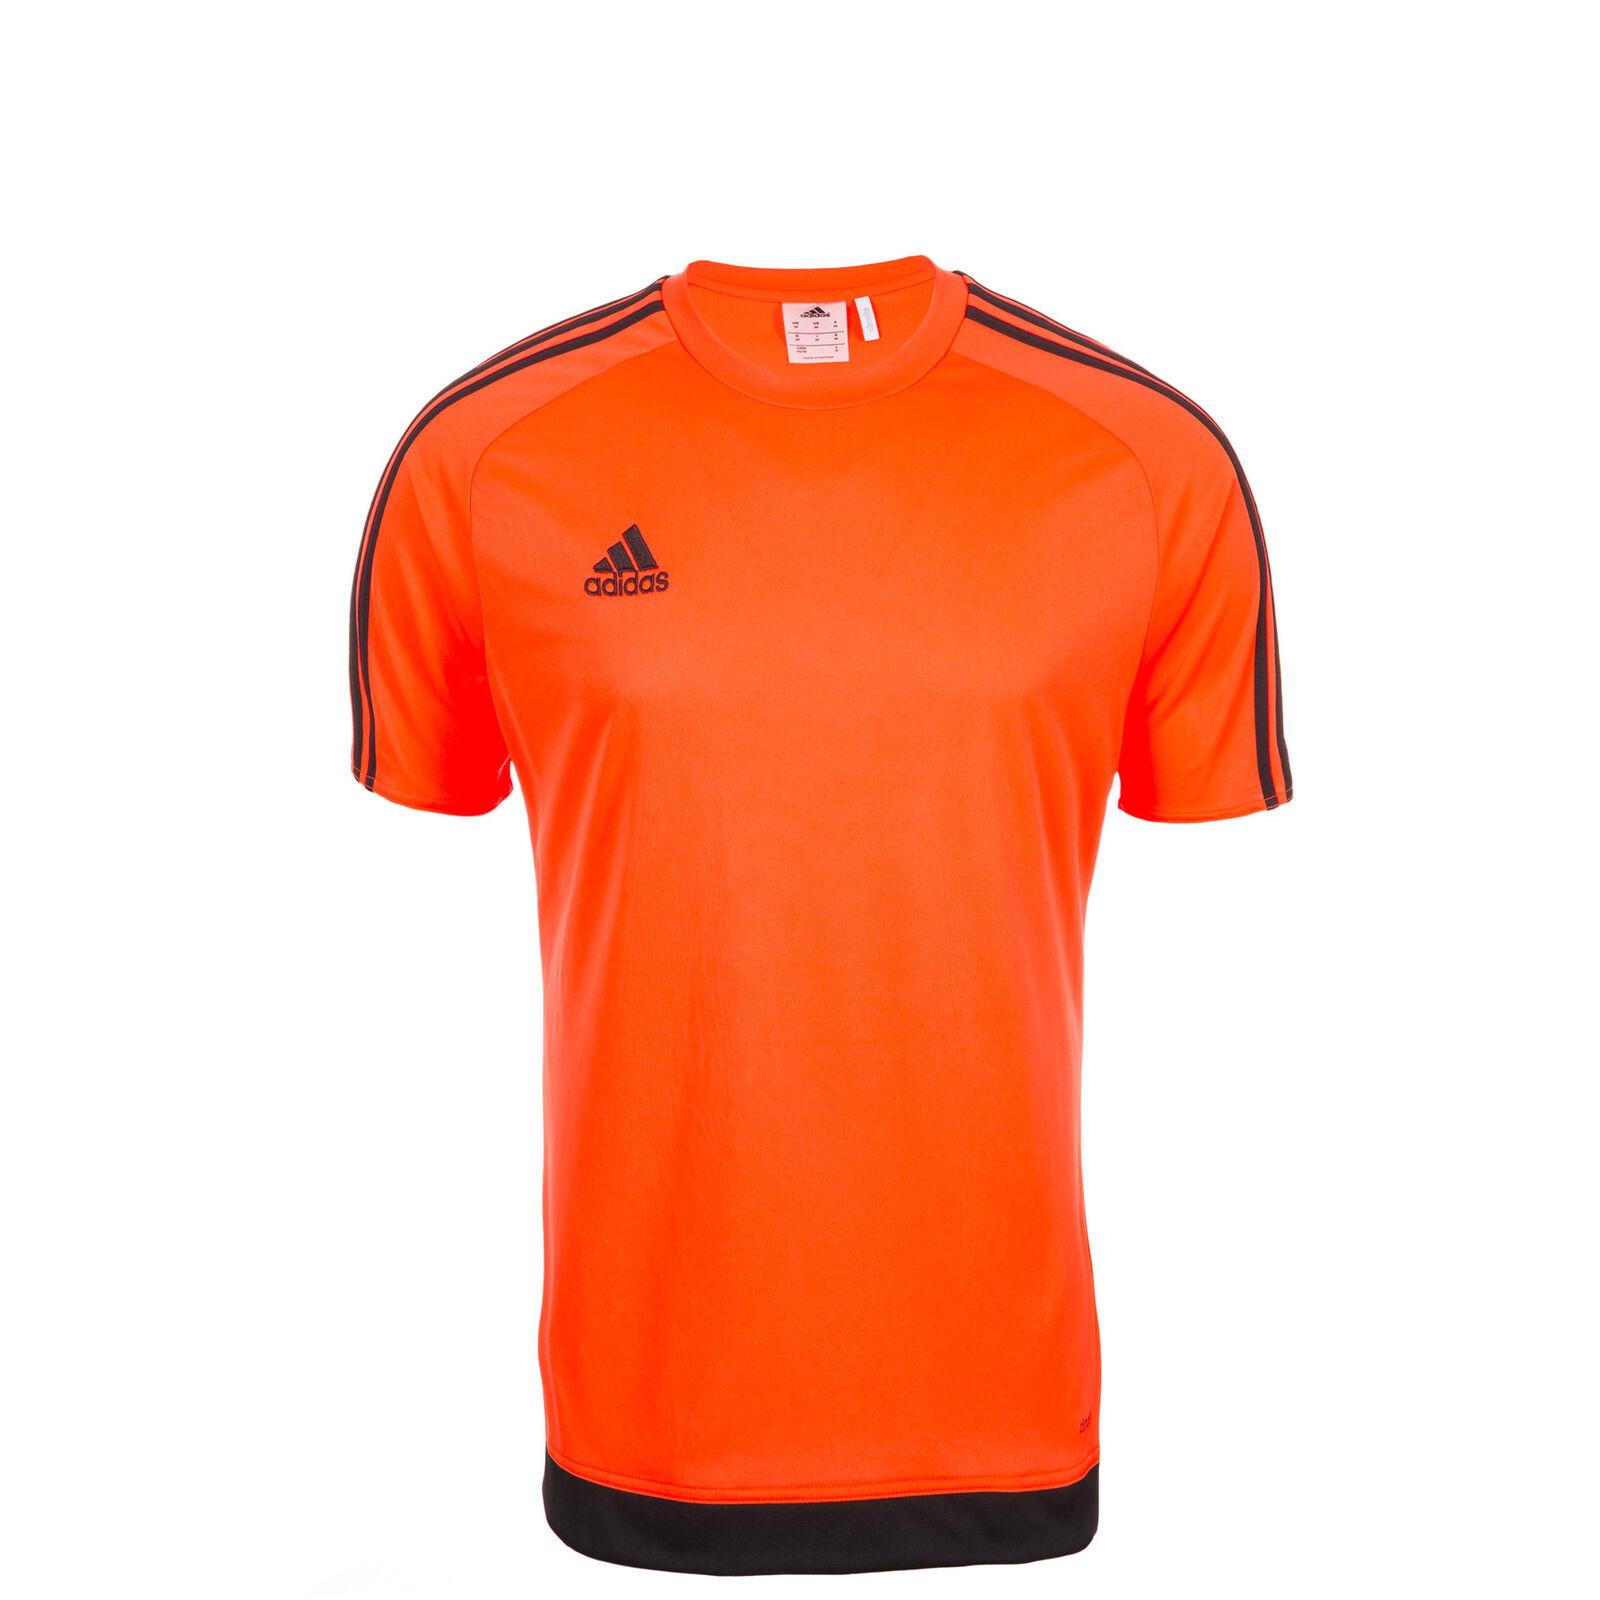 adidas Trikot Estro 15 Kurzarm Kids Orange schwarz 140